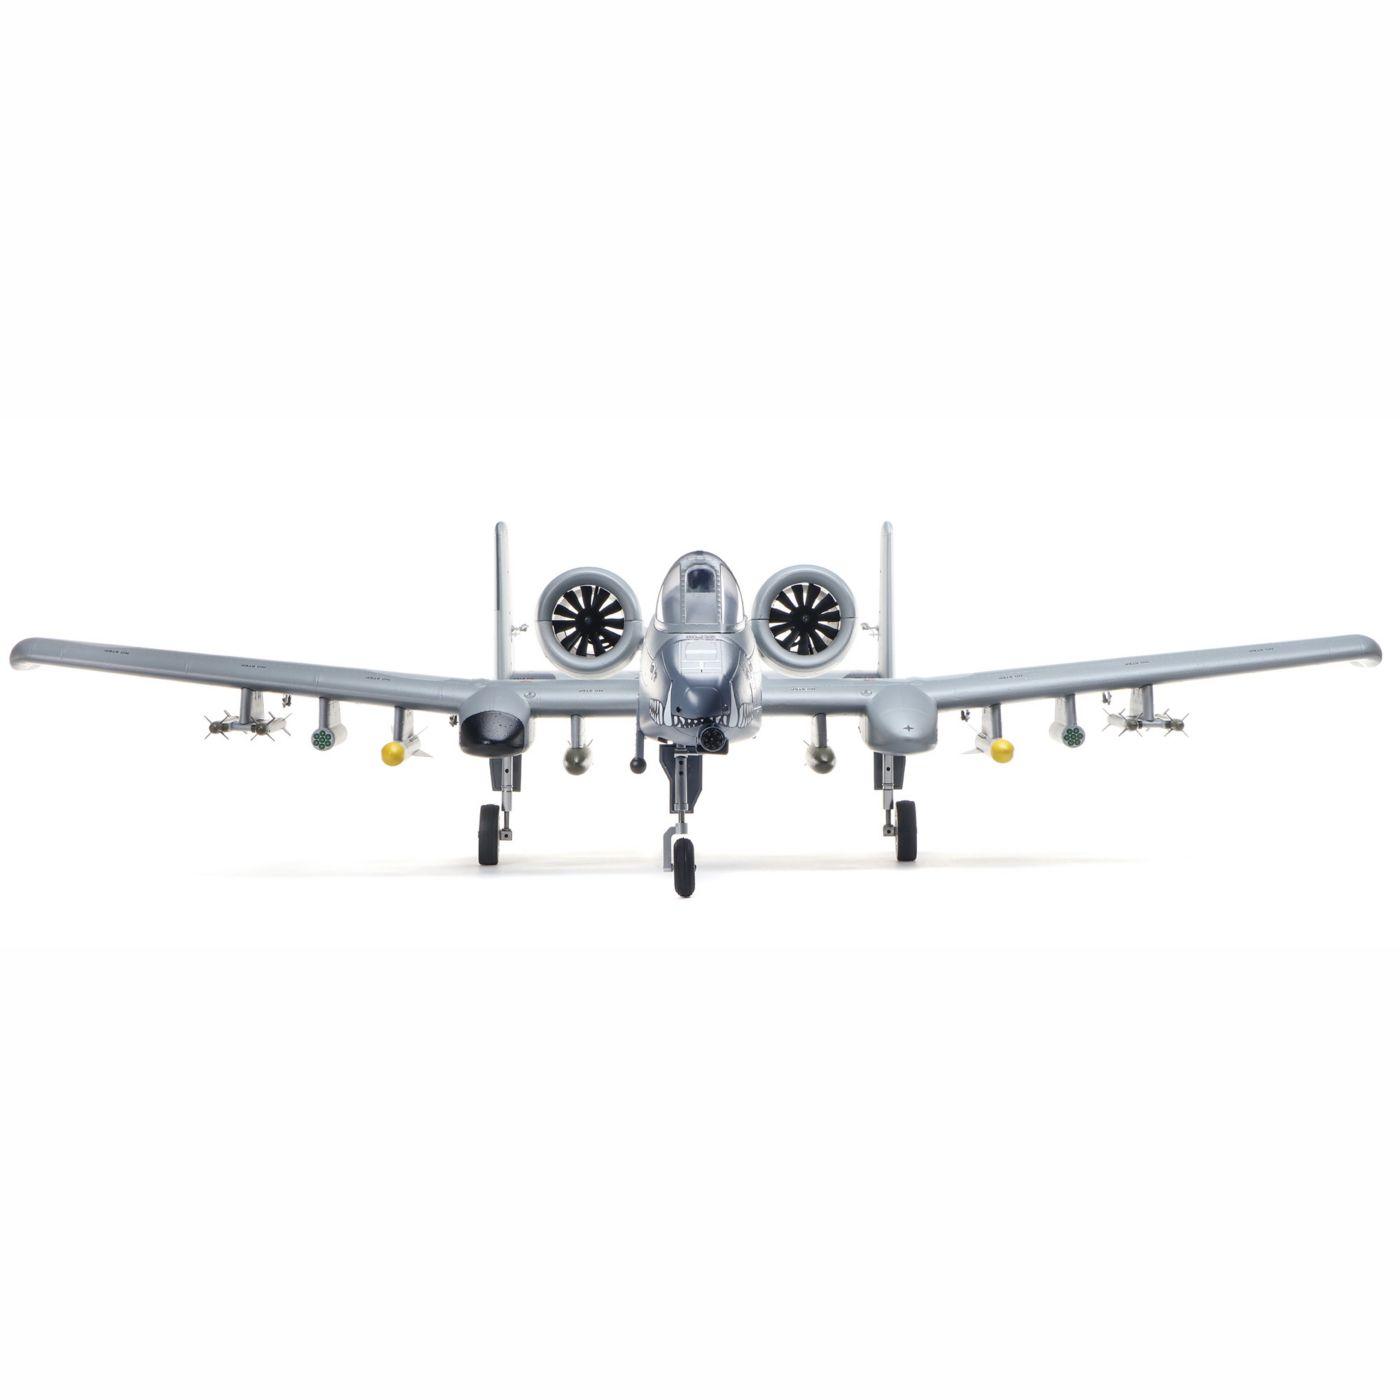 A-10 Thunderbolt II E-flite